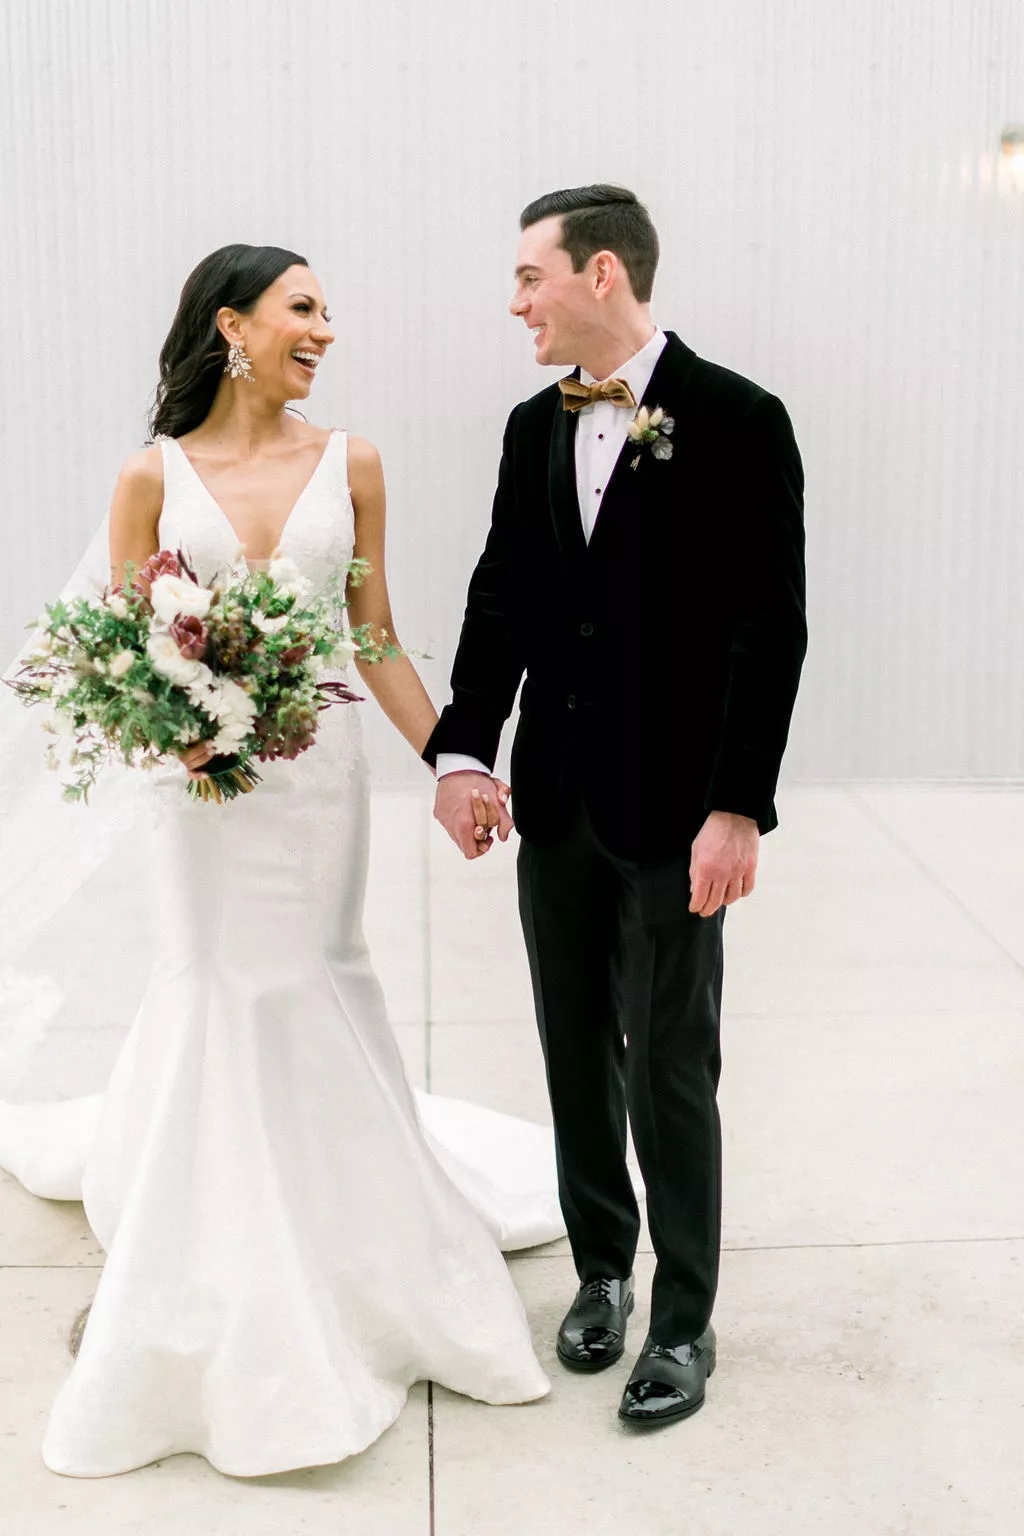 NwlZTd5QExg - Как найти веселого ведущего на свою свадьбу